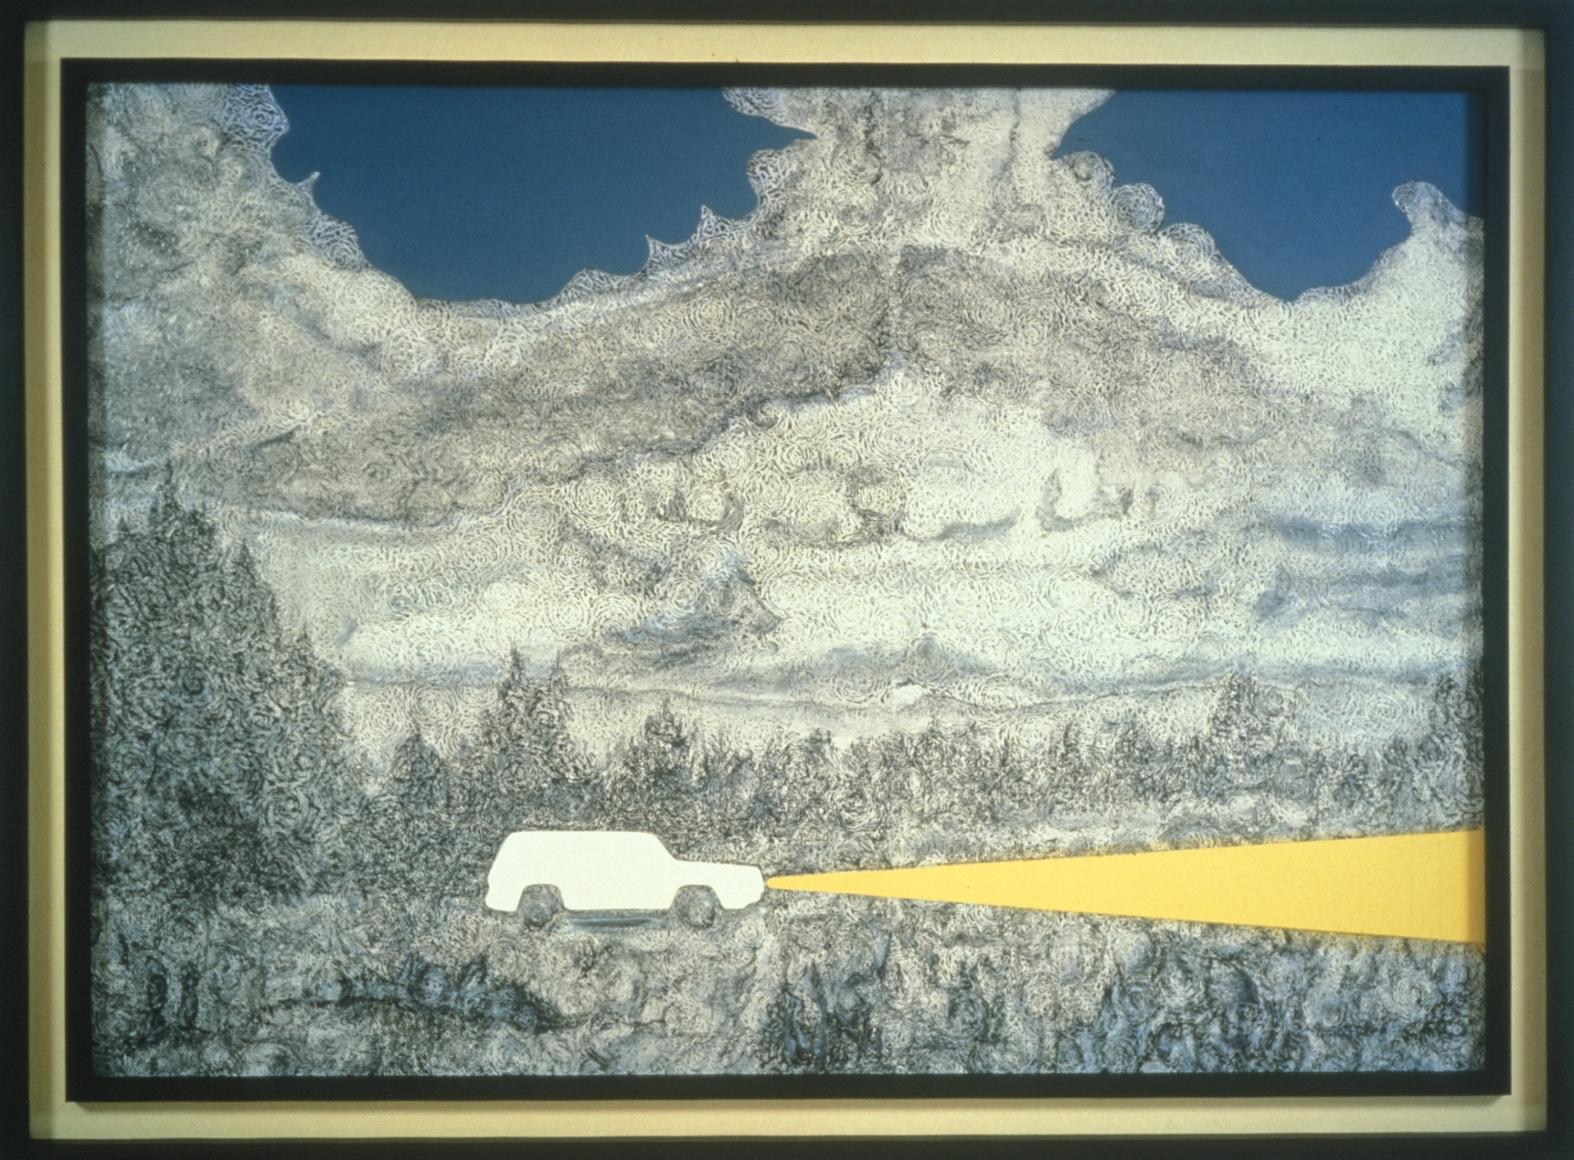 RICHARD ARTSCHWAGER, White Cherokee (Pastoral I), 1991-98